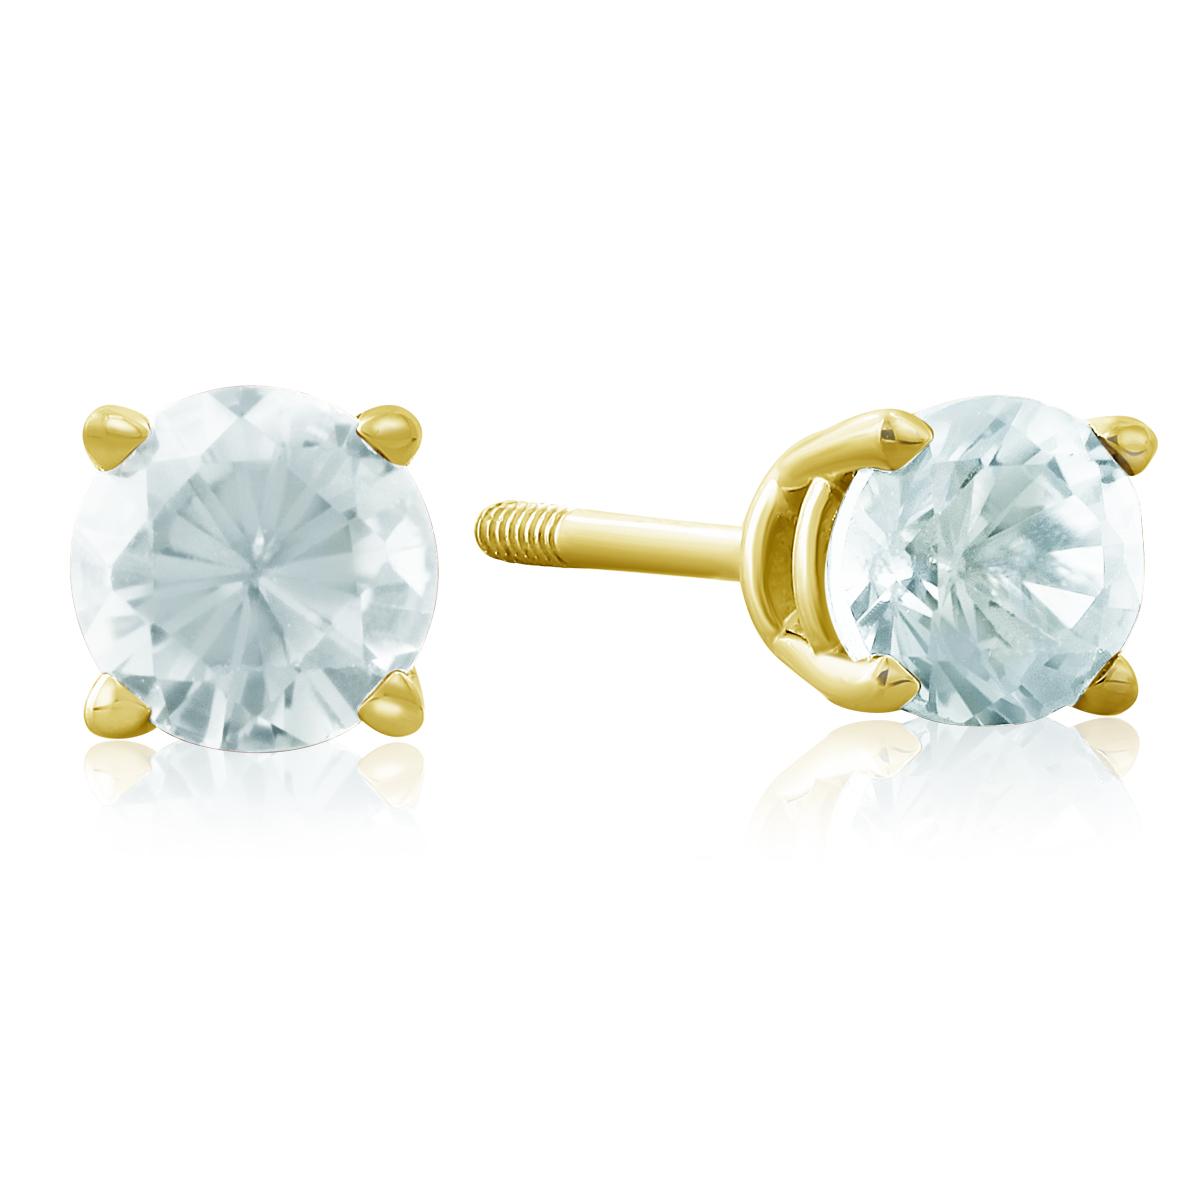 1 2 Carat Aquamarine Stud Earrings in 14k Yellow Gold